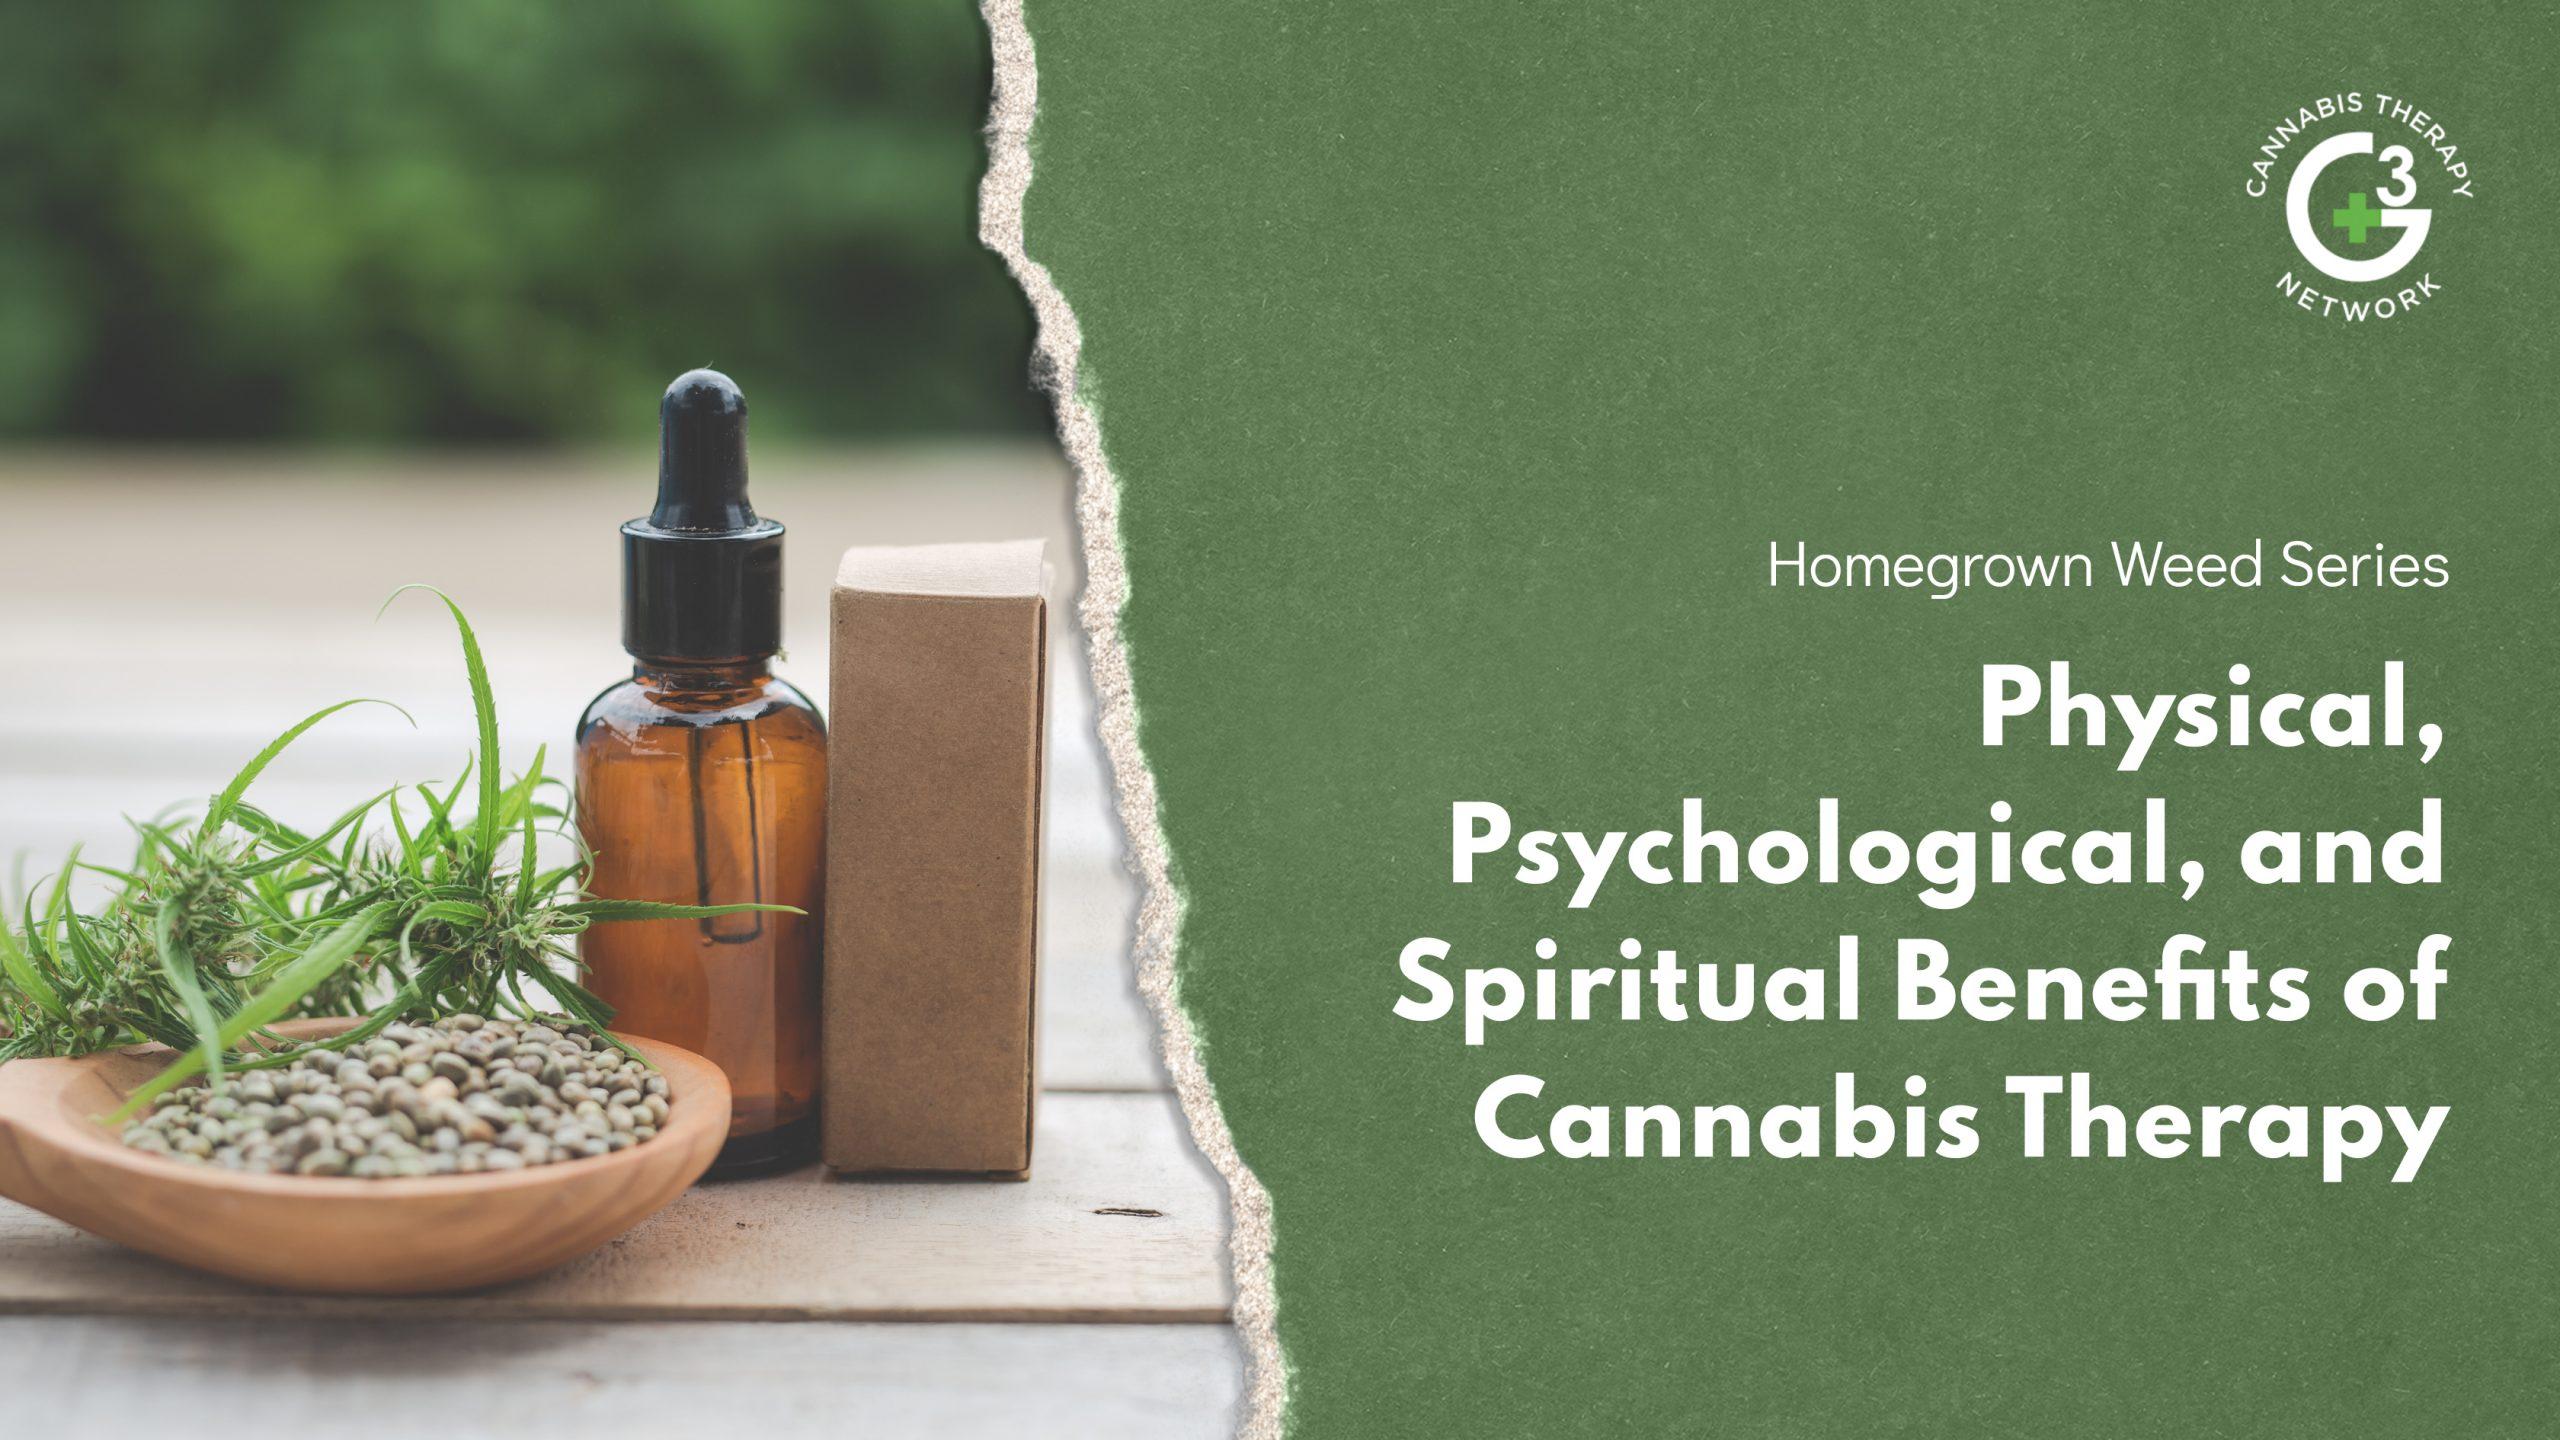 Physical, Psychological, and Spiritual Benefits of Marijuana Therapy